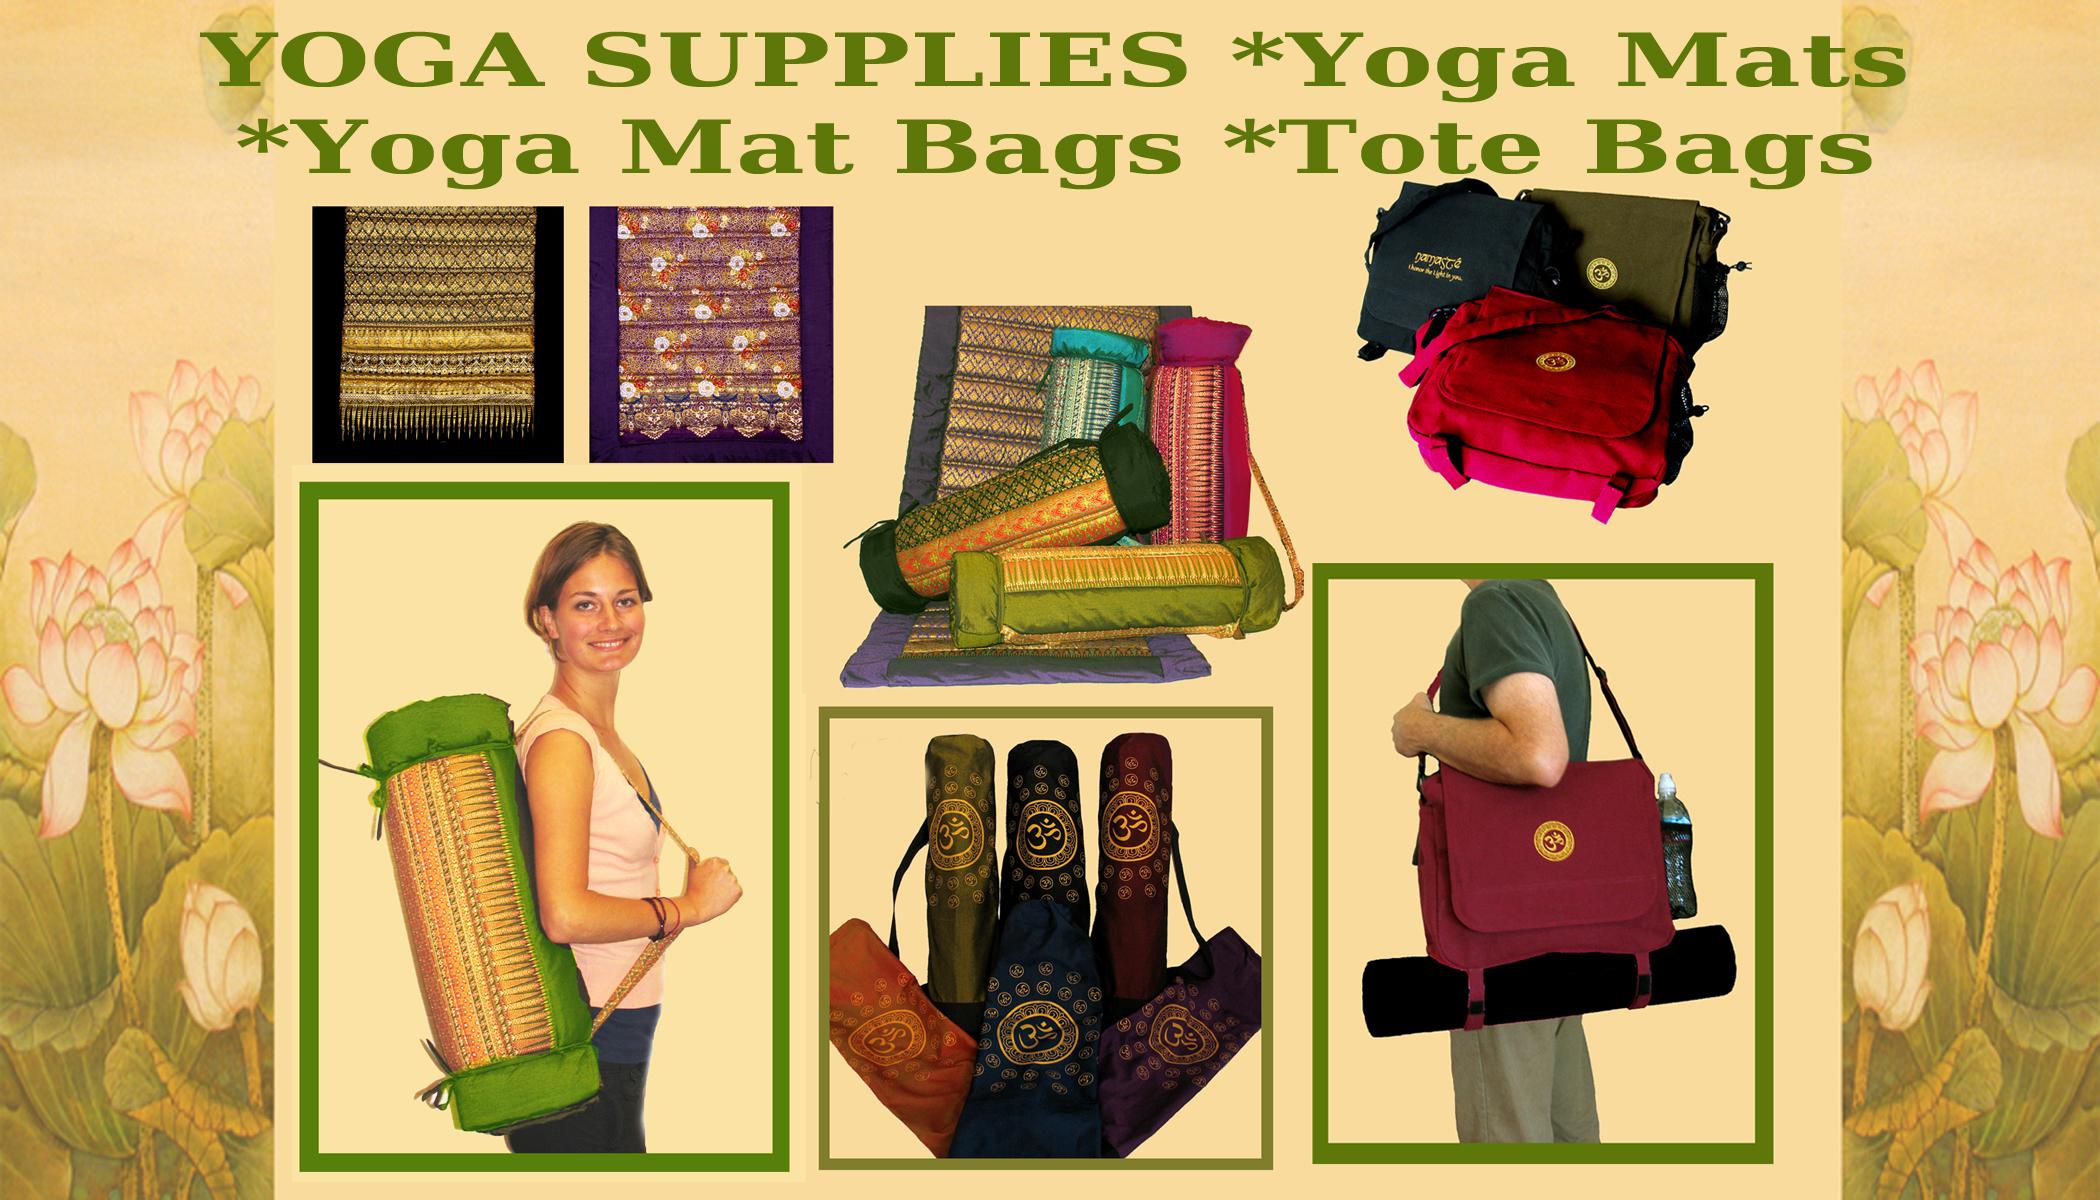 yogasupplies1.jpg